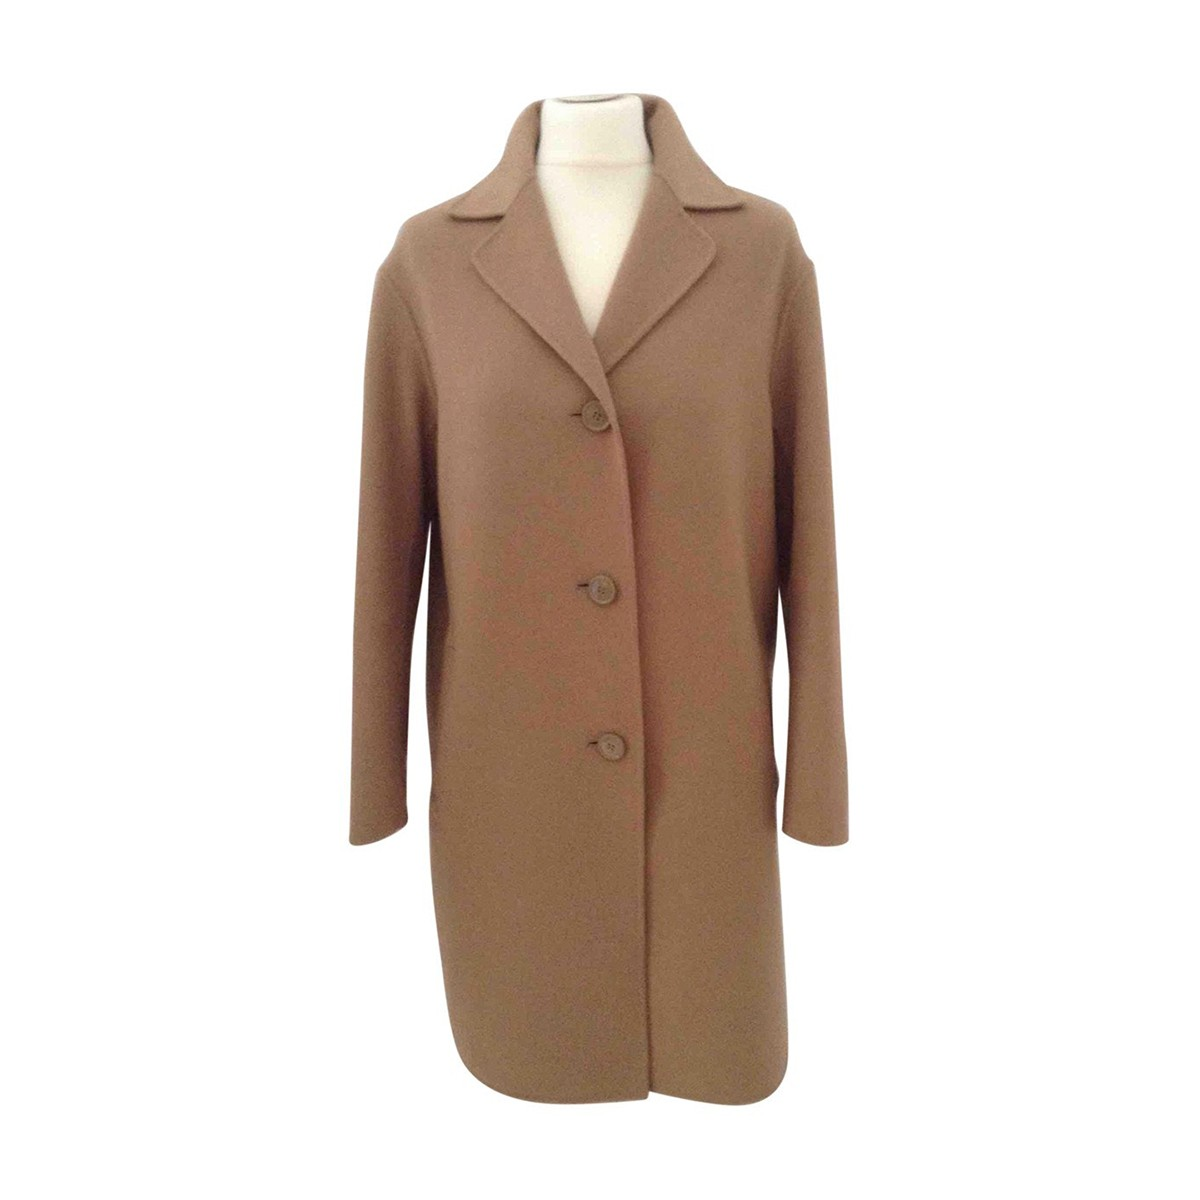 MAX MARA fiorina coat